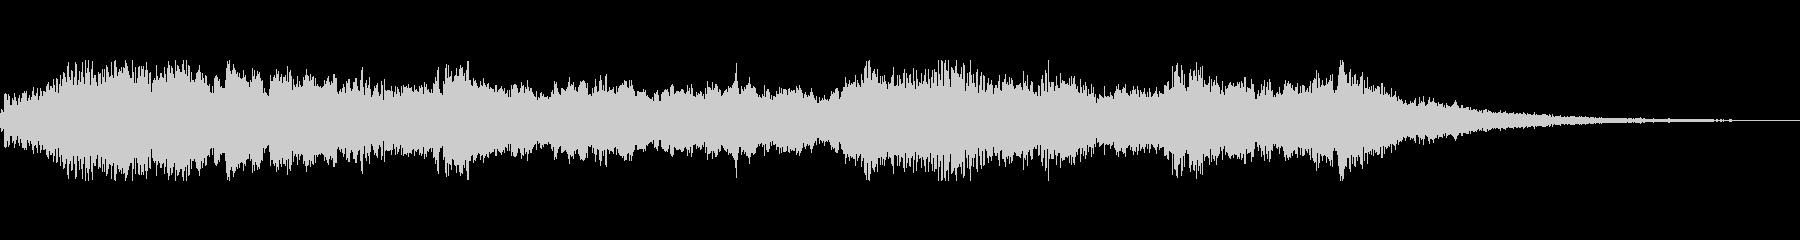 Eのキーの未再生の波形